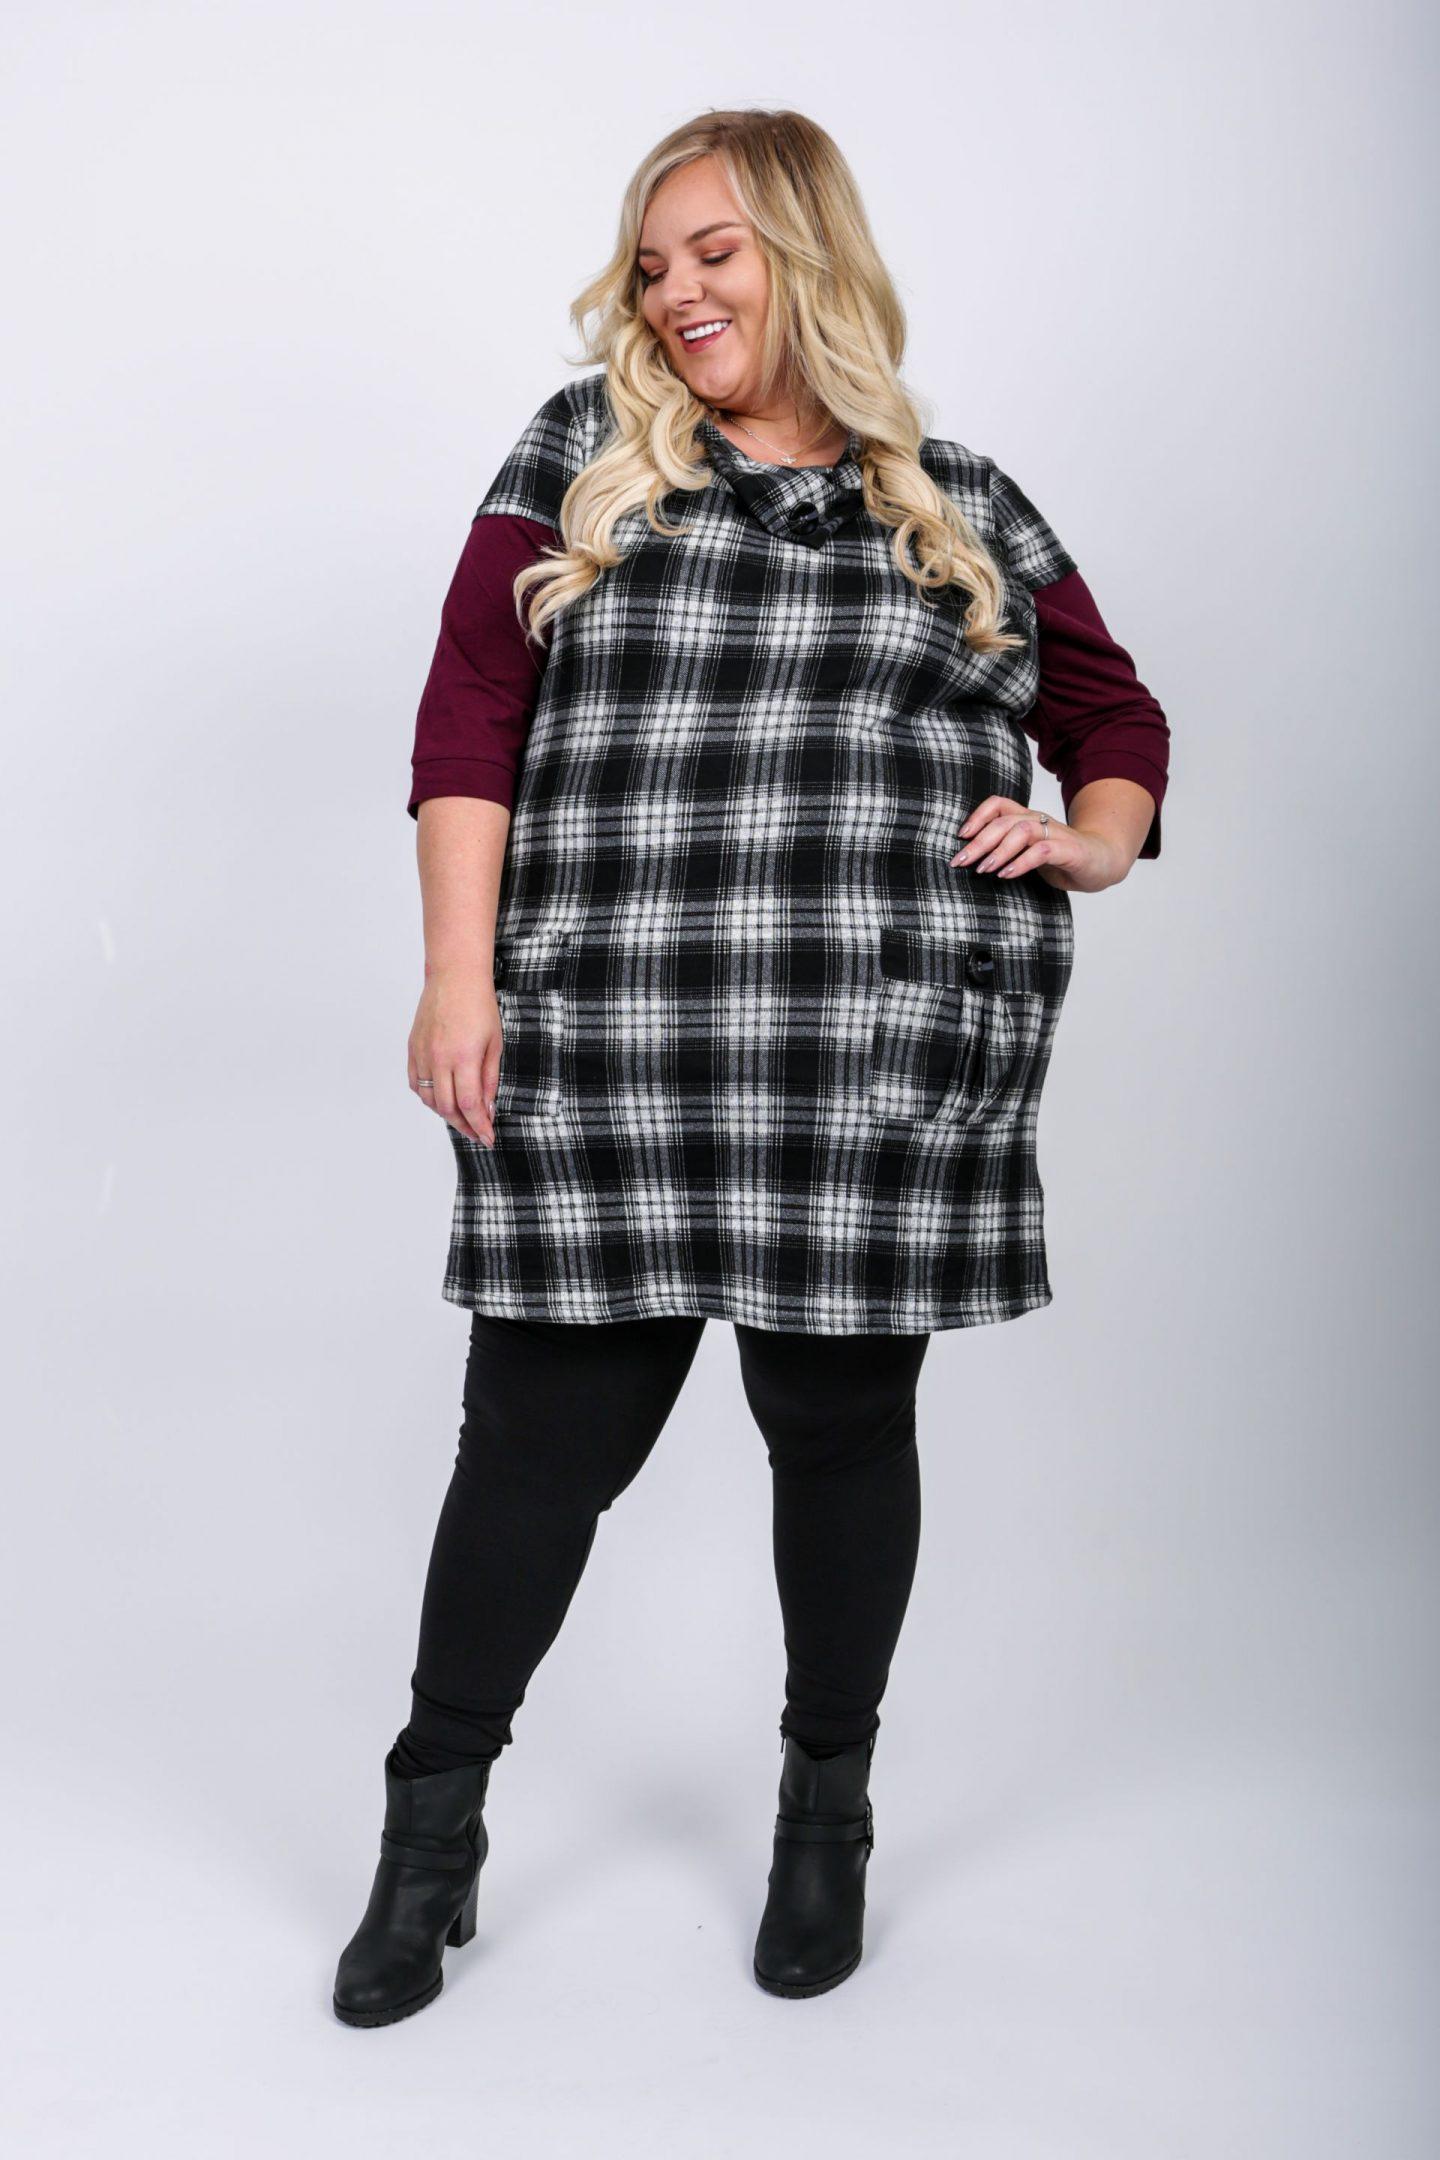 WhatLauraLoves For The Bridges Sunderland Lookbook Plus Size Yours Clothing